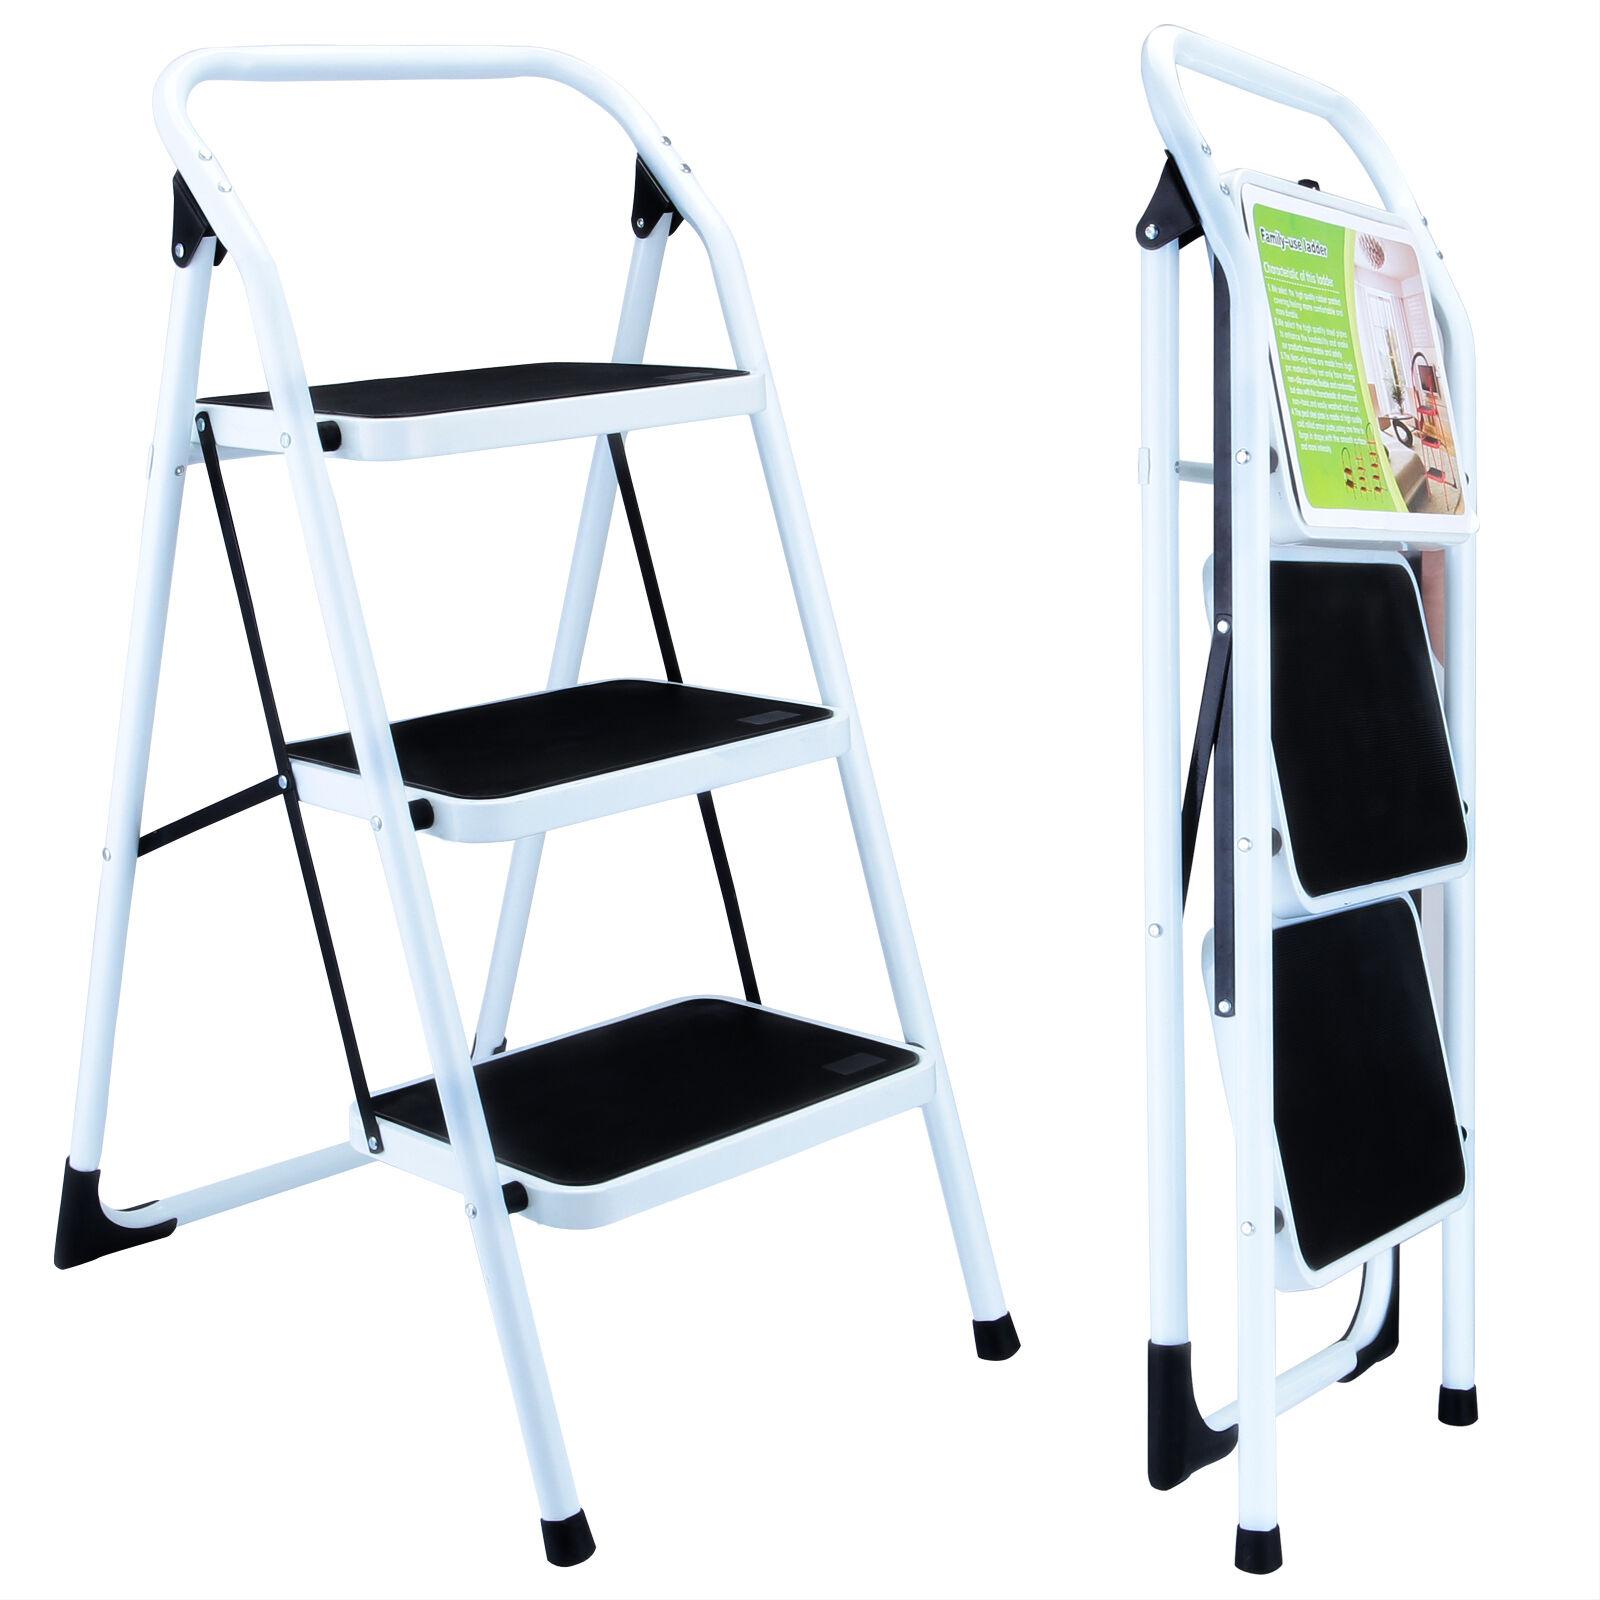 Portable Folding Step Ladder Non Slip Safety Tread